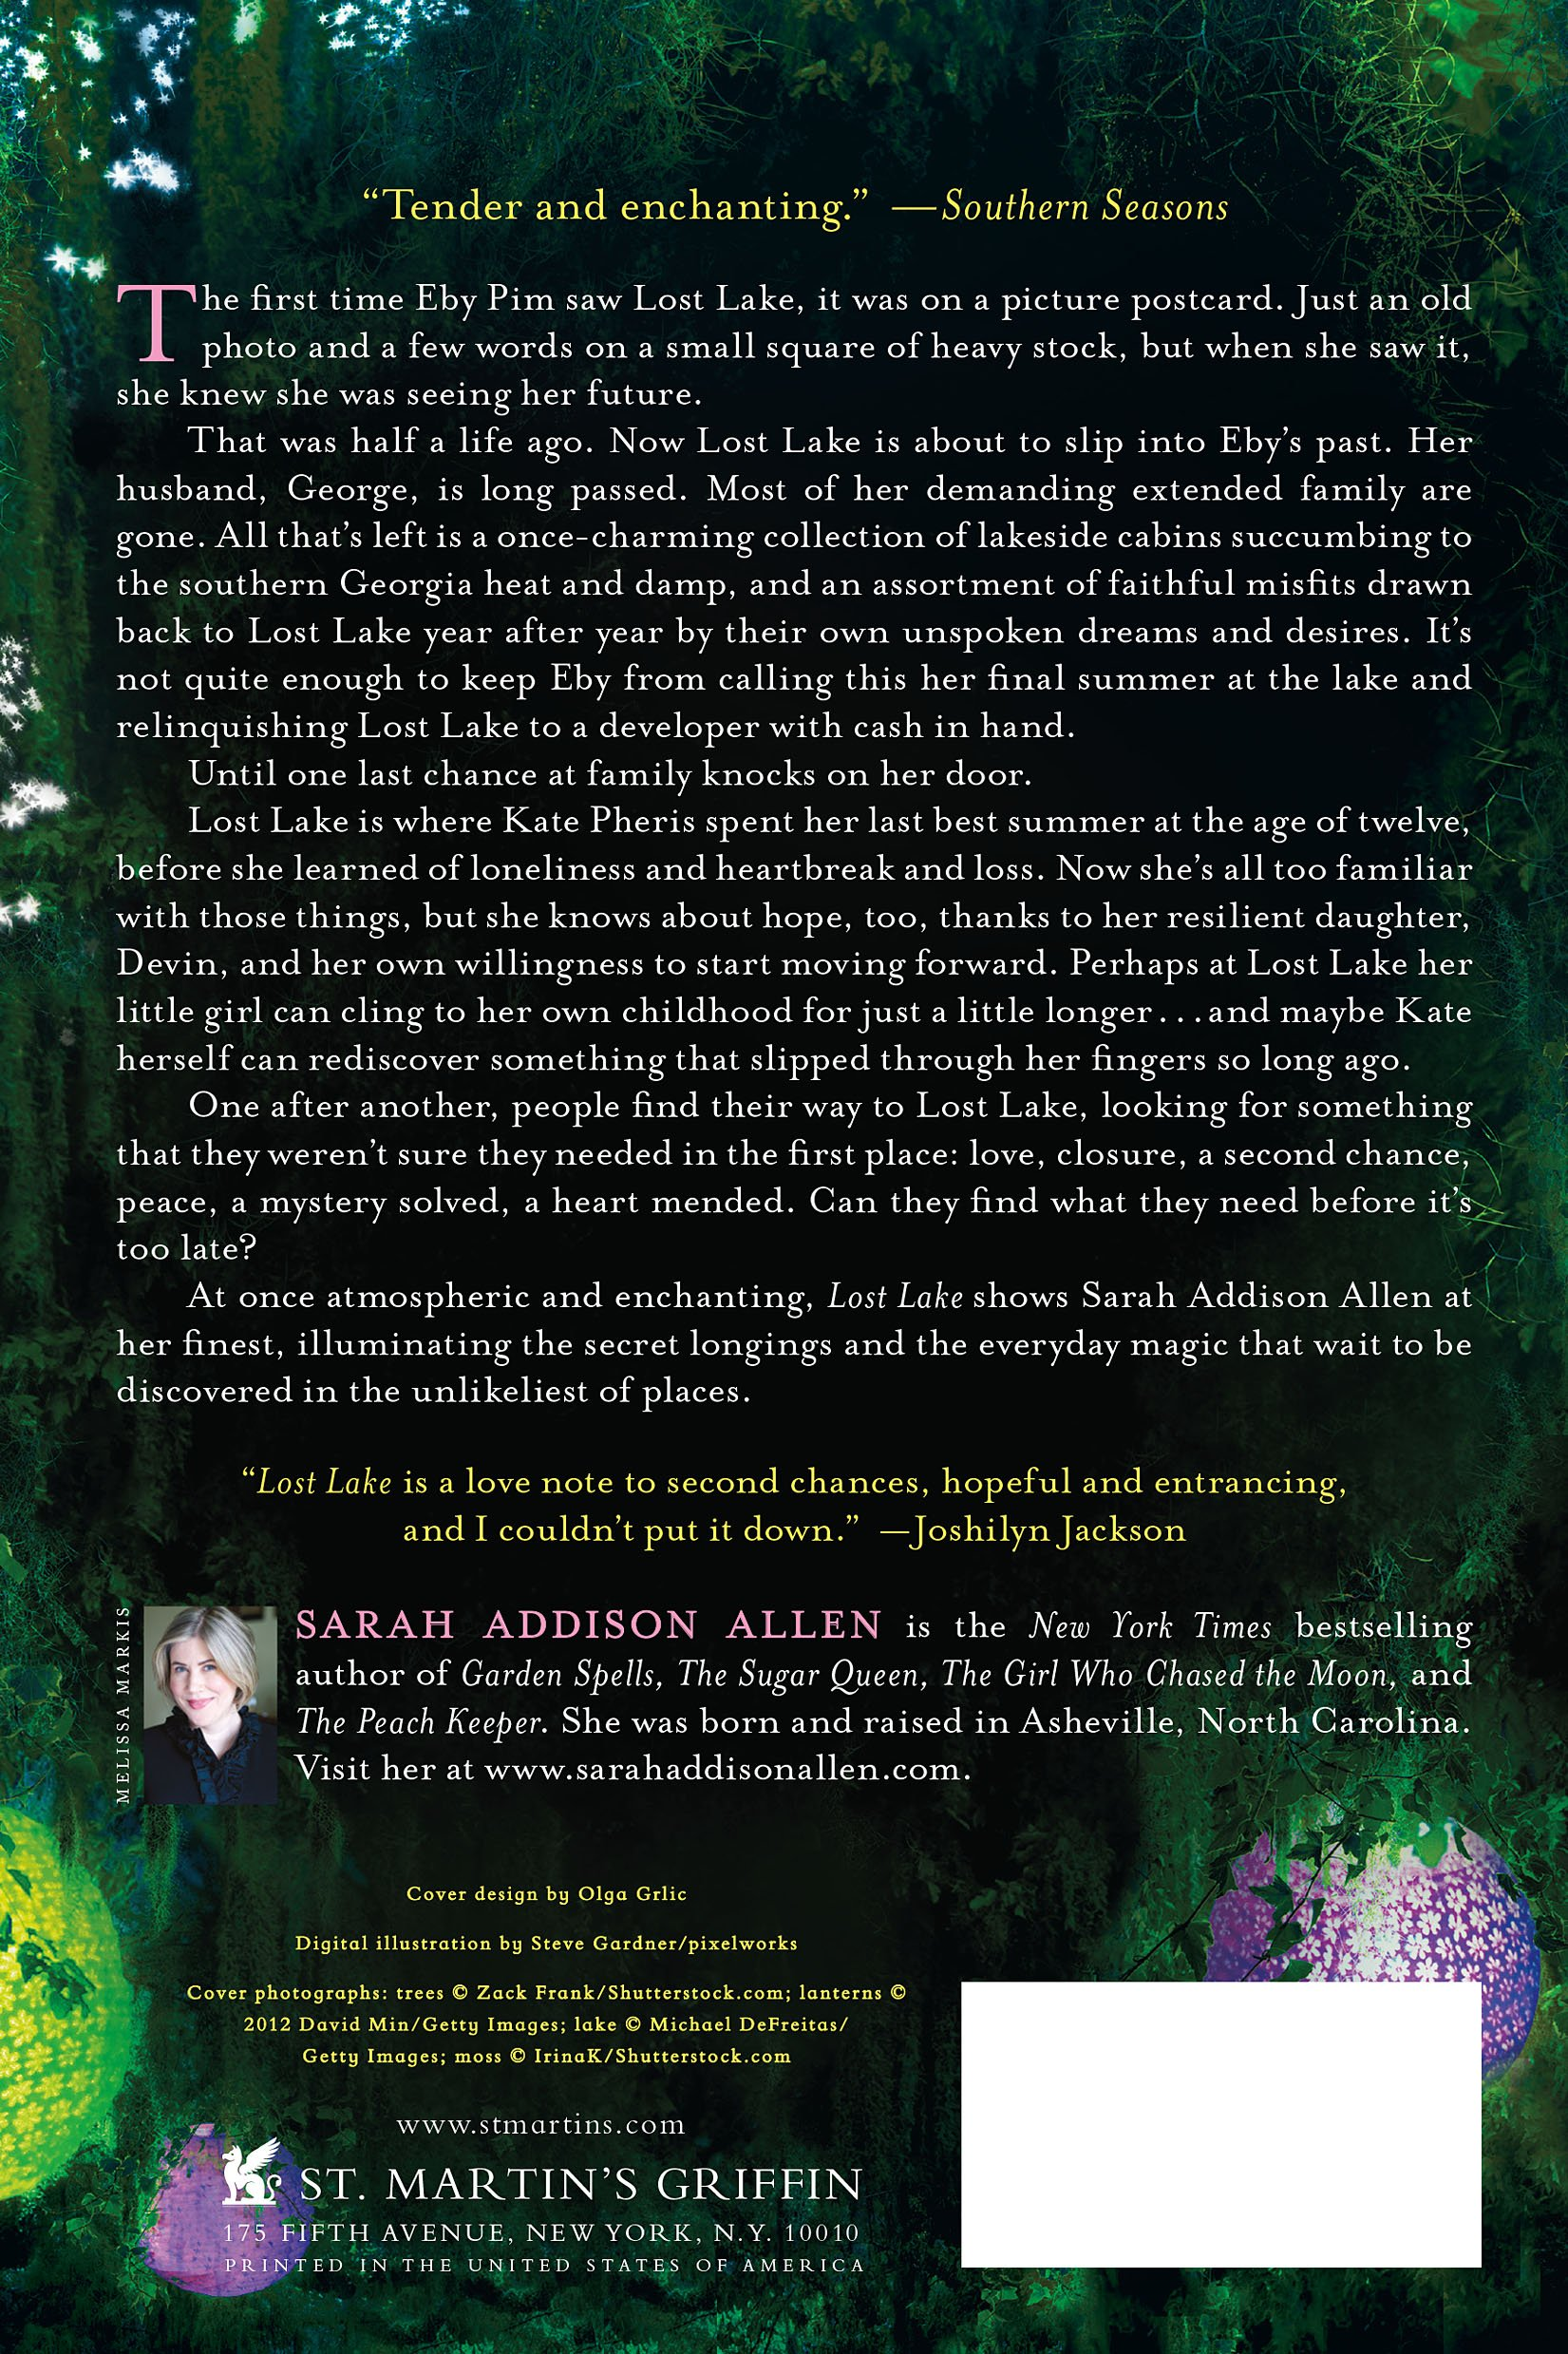 Lost Lake: A Novel: Sarah Addison Allen: 9781250019820: Amazon: Books